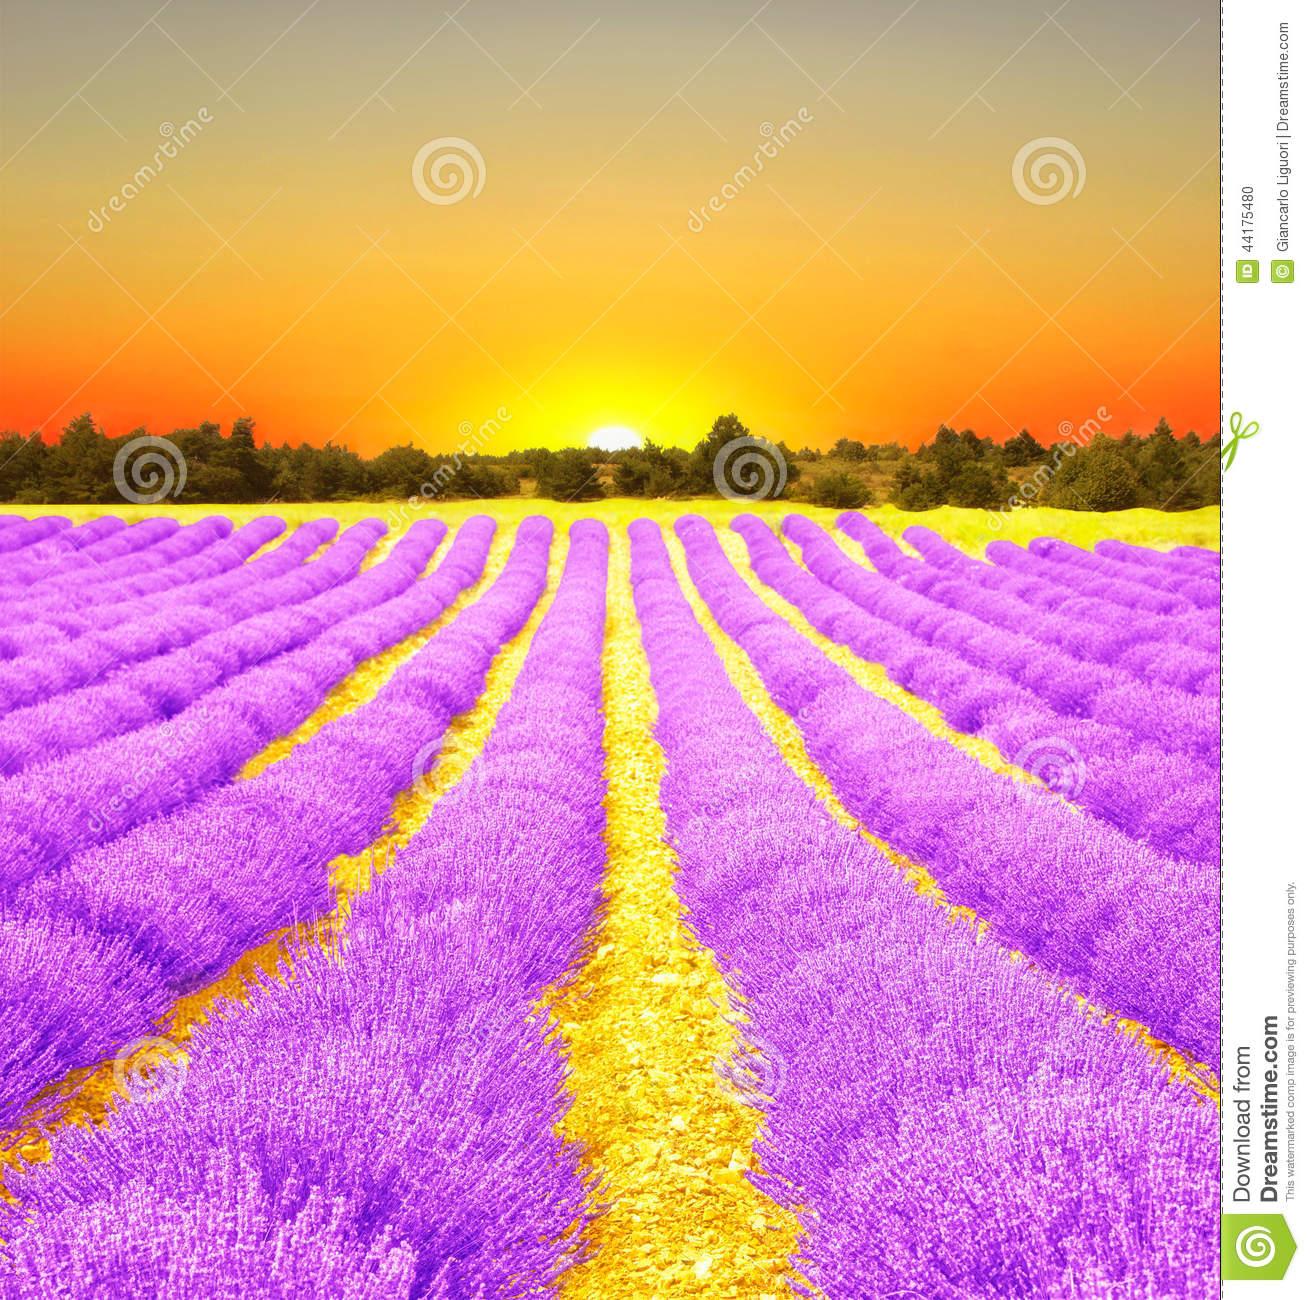 Lavender Field Sunrise Stock Photos, Images, & Pictures.